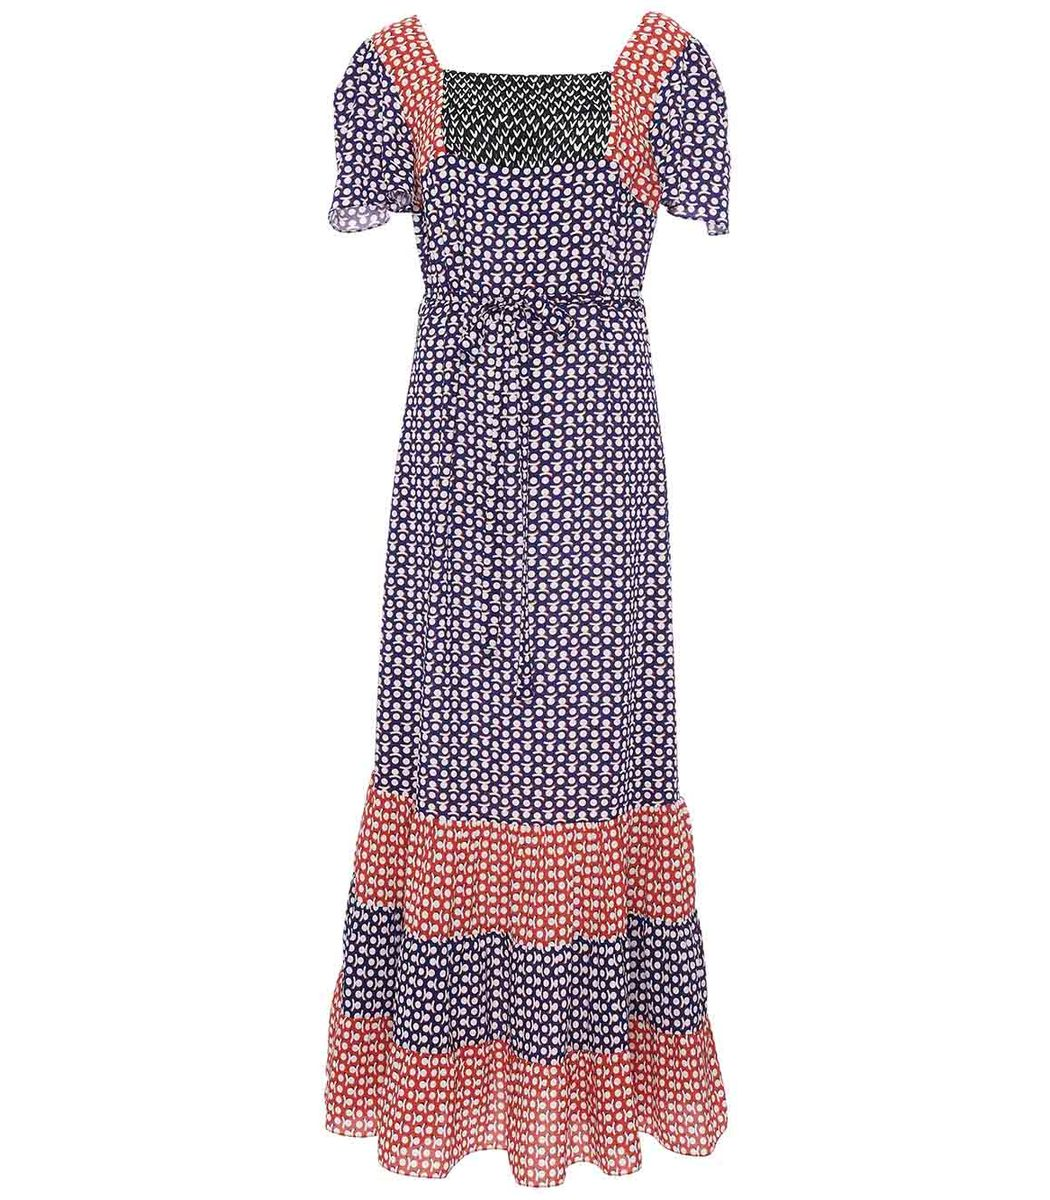 DURO OLOWU Multicolor Novelty Print Patterned Dress